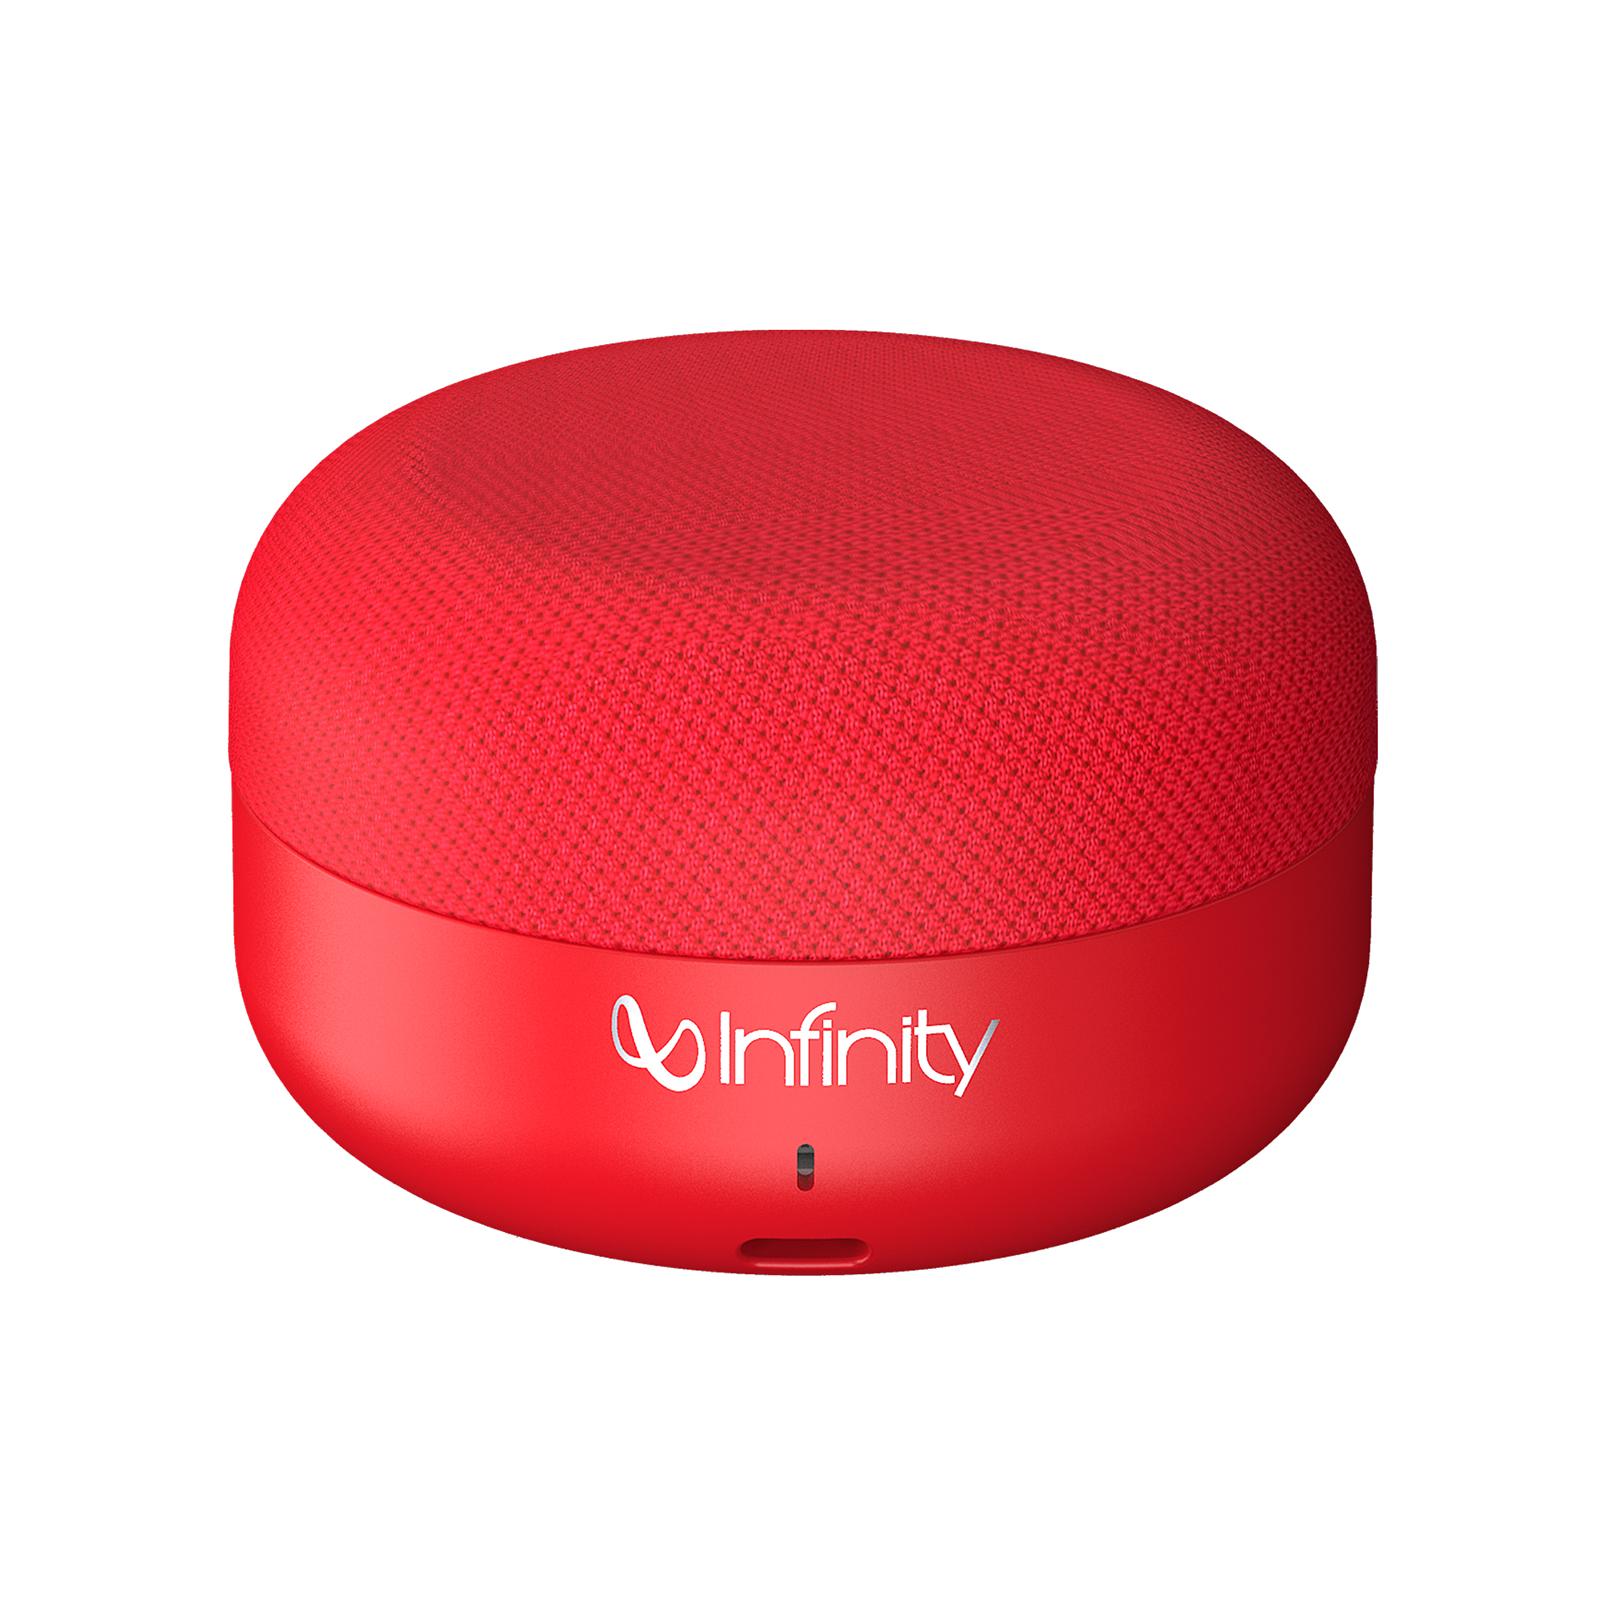 INFINITY FUZE PINT - Red - Portable Wireless Speakers - Hero